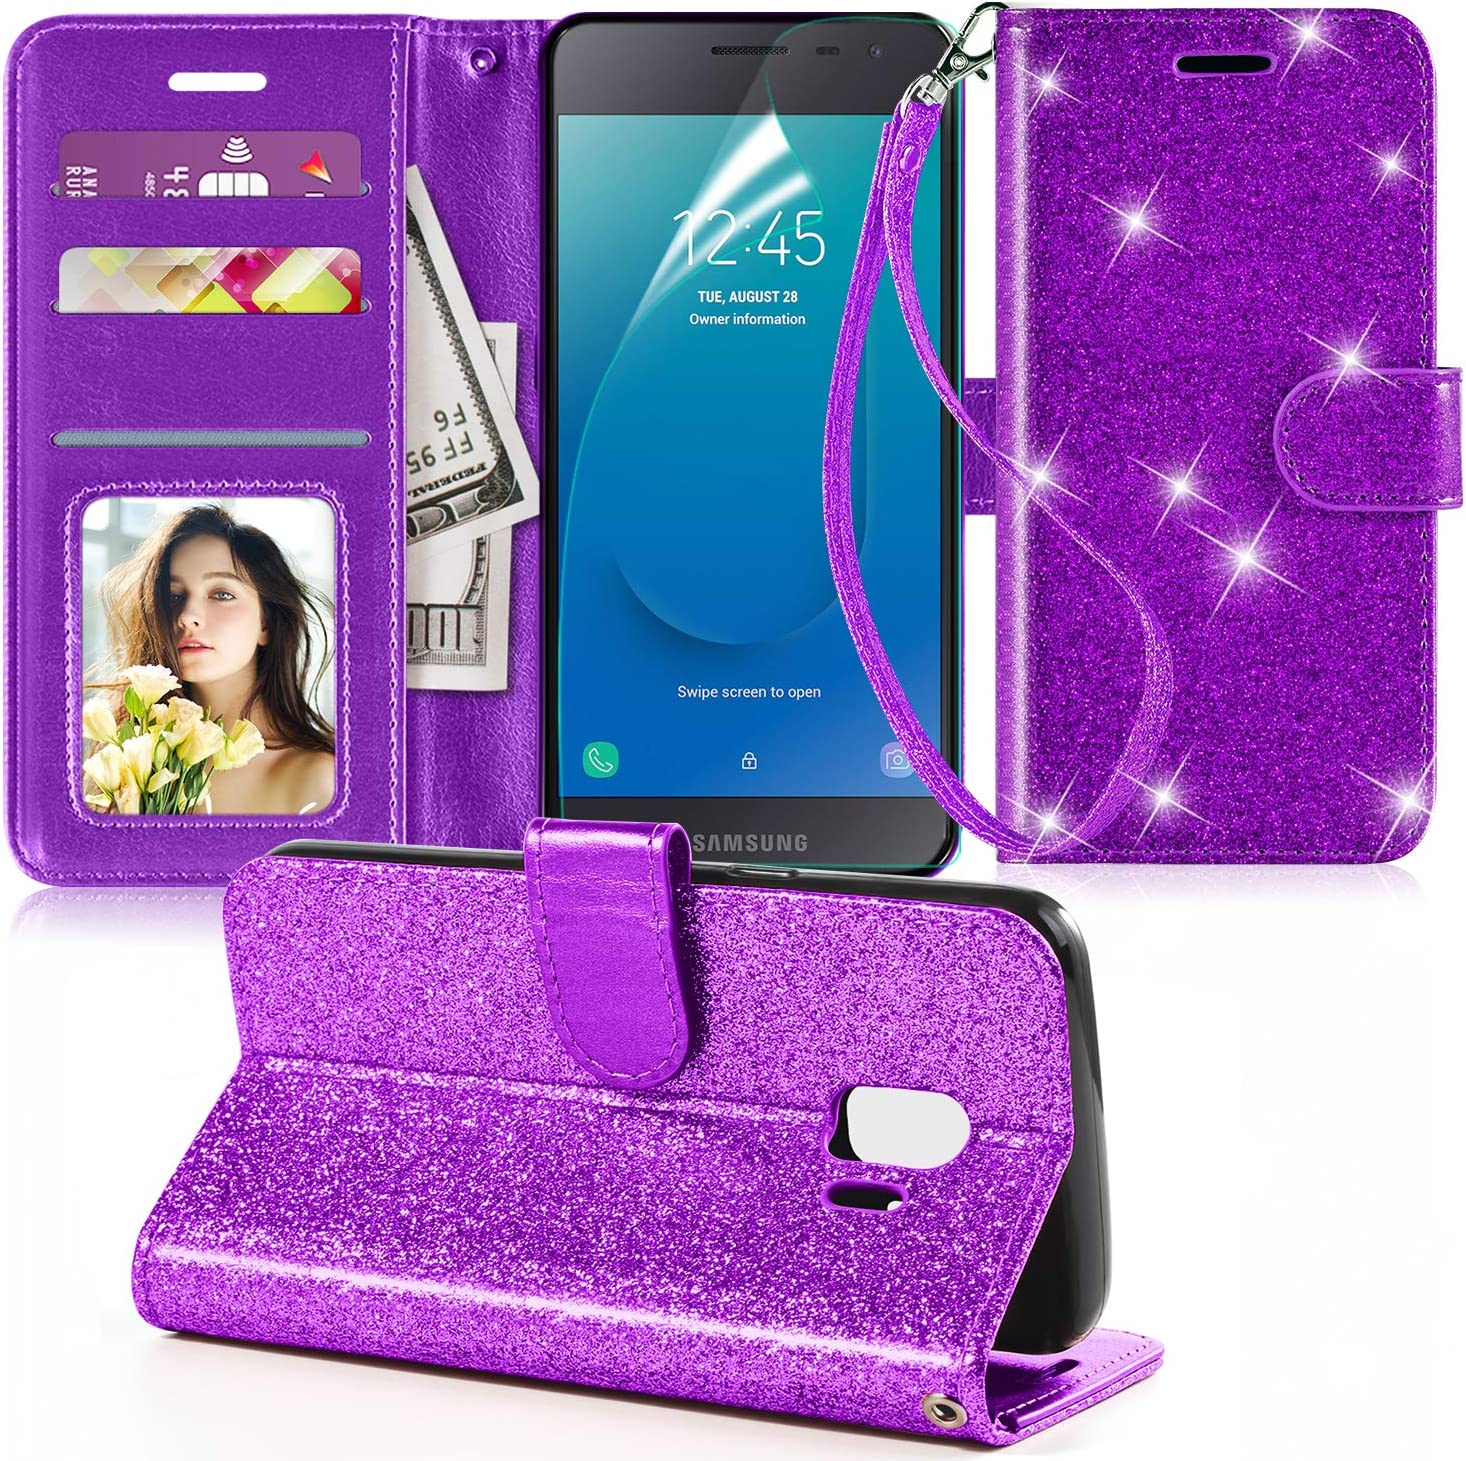 Case for Samsung Galaxy J2,J2 Core Case,J2 Dash Case,J2 Pure Case W/Wrist Strap&Screen Protector&Kickstand&Credit Card Slots,PU Leather Bling Glitter Flip Wallet Case Cover for Girls Women,Purple